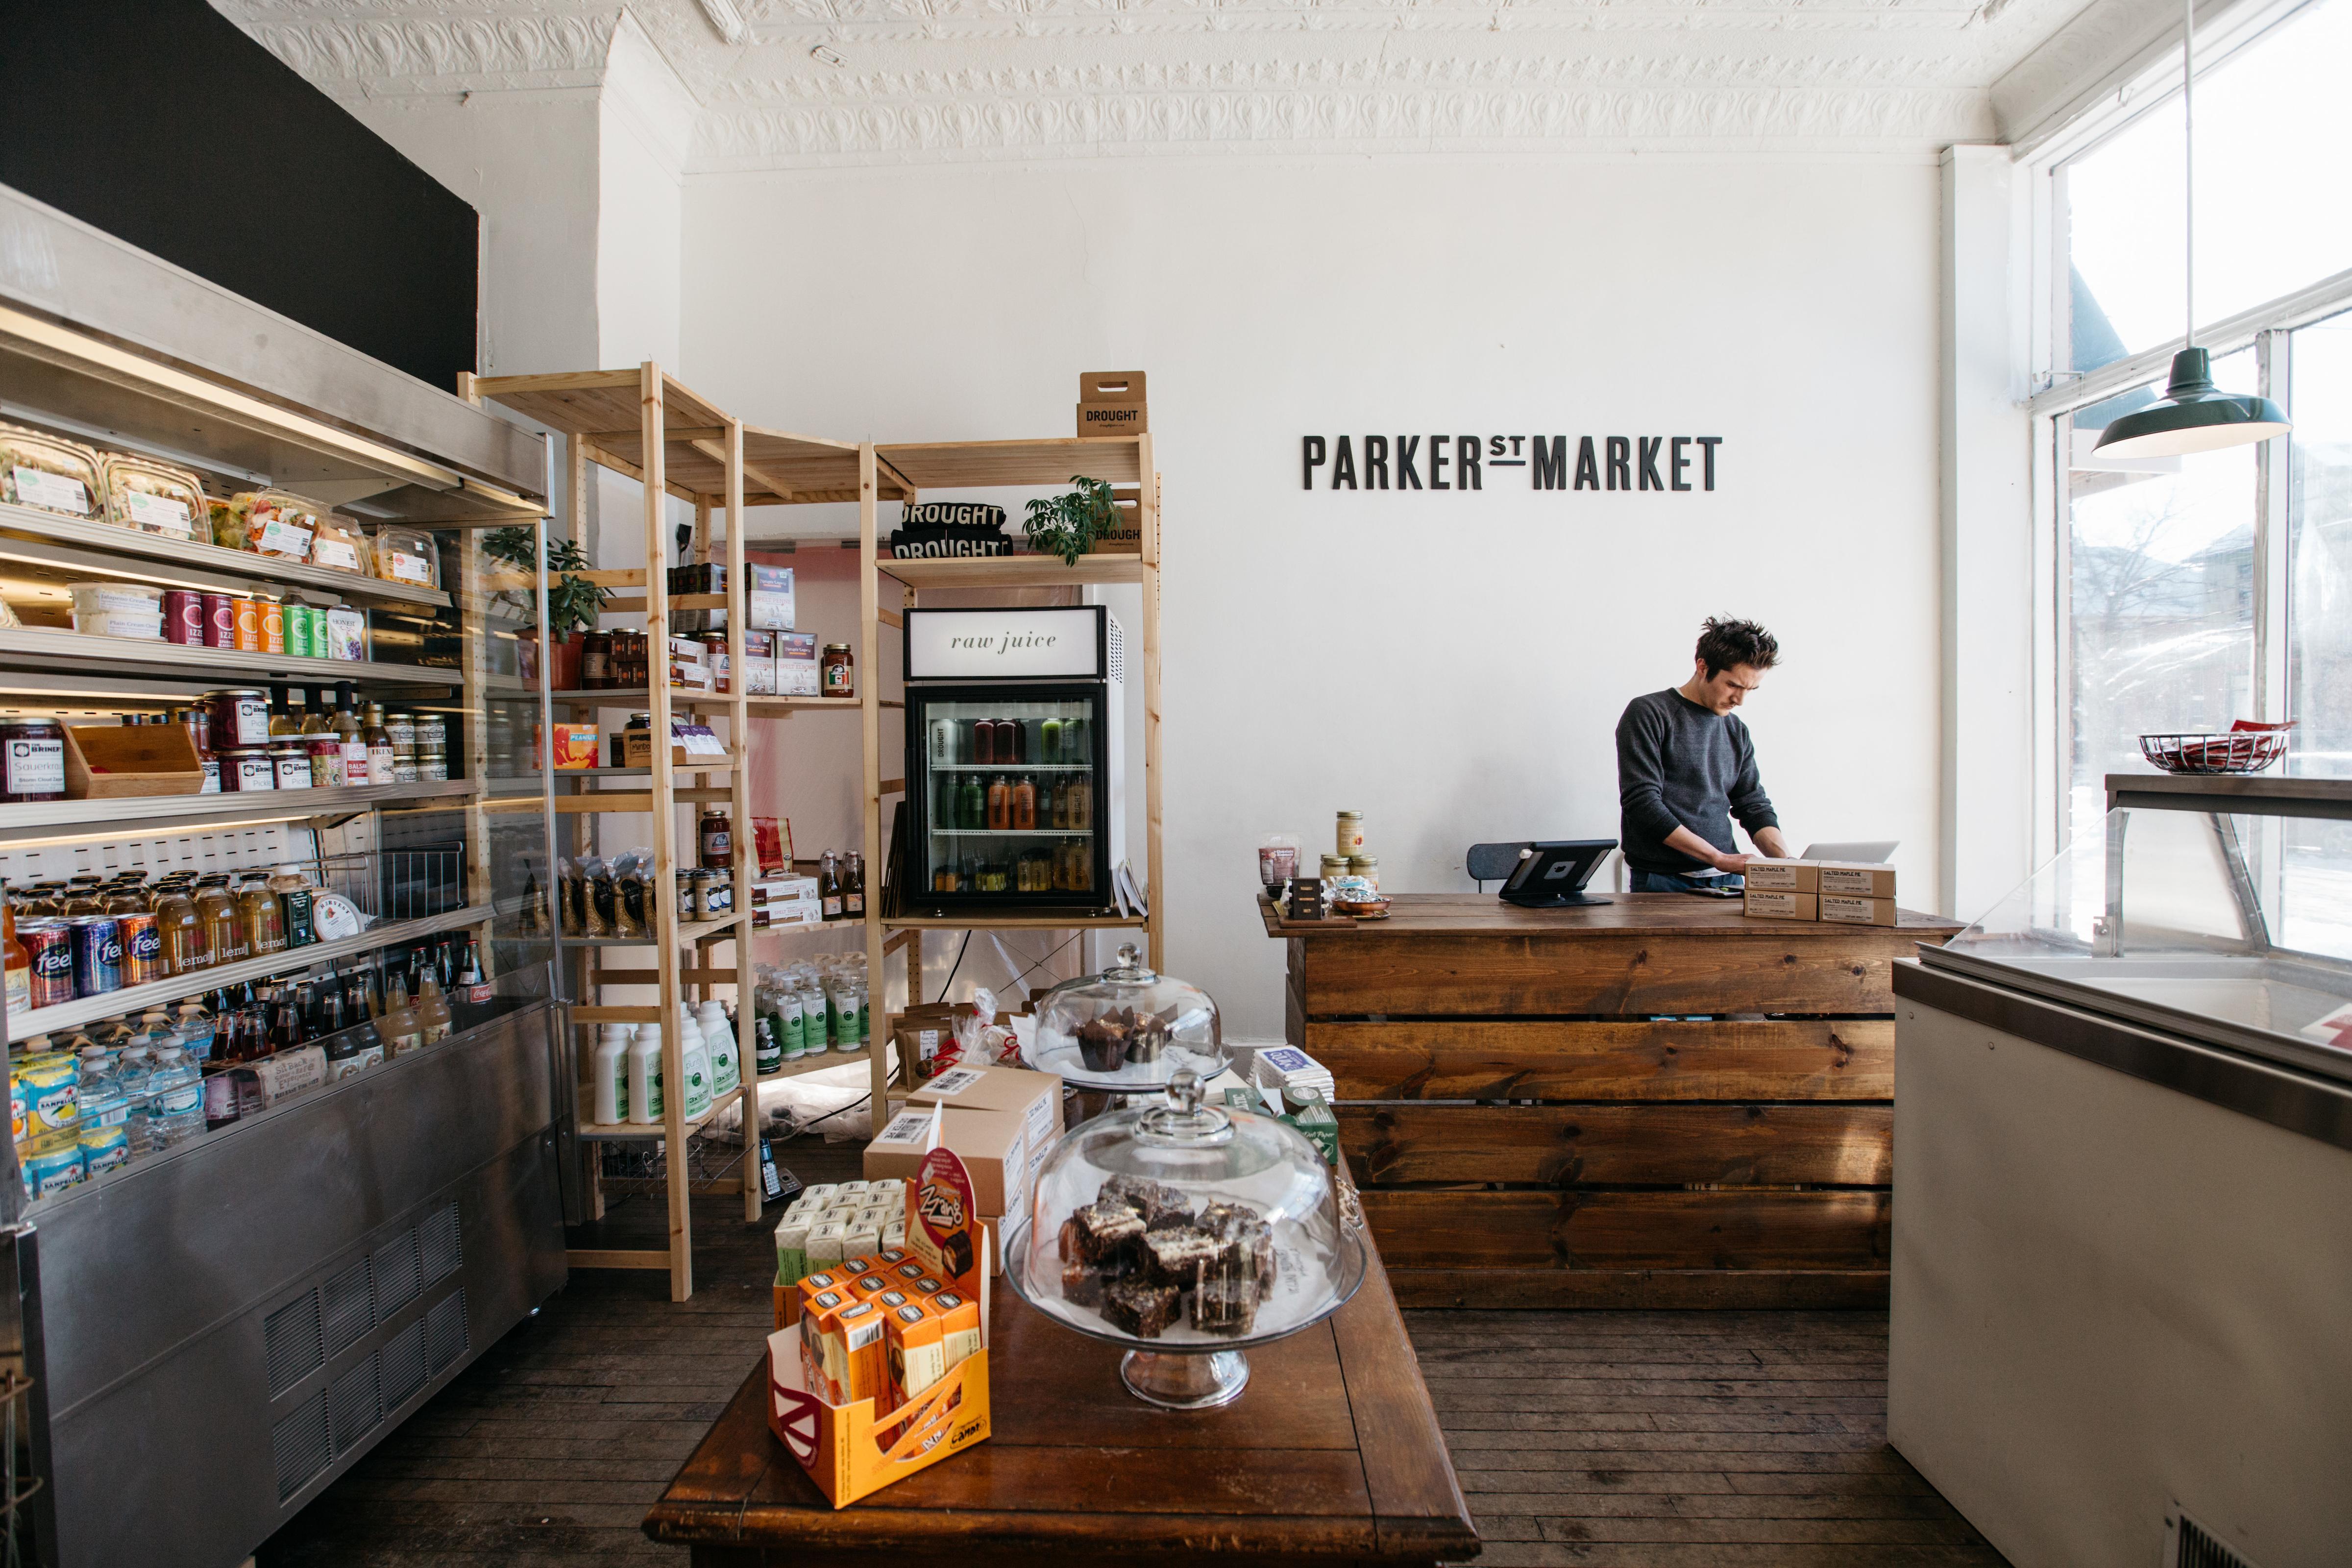 parker street market